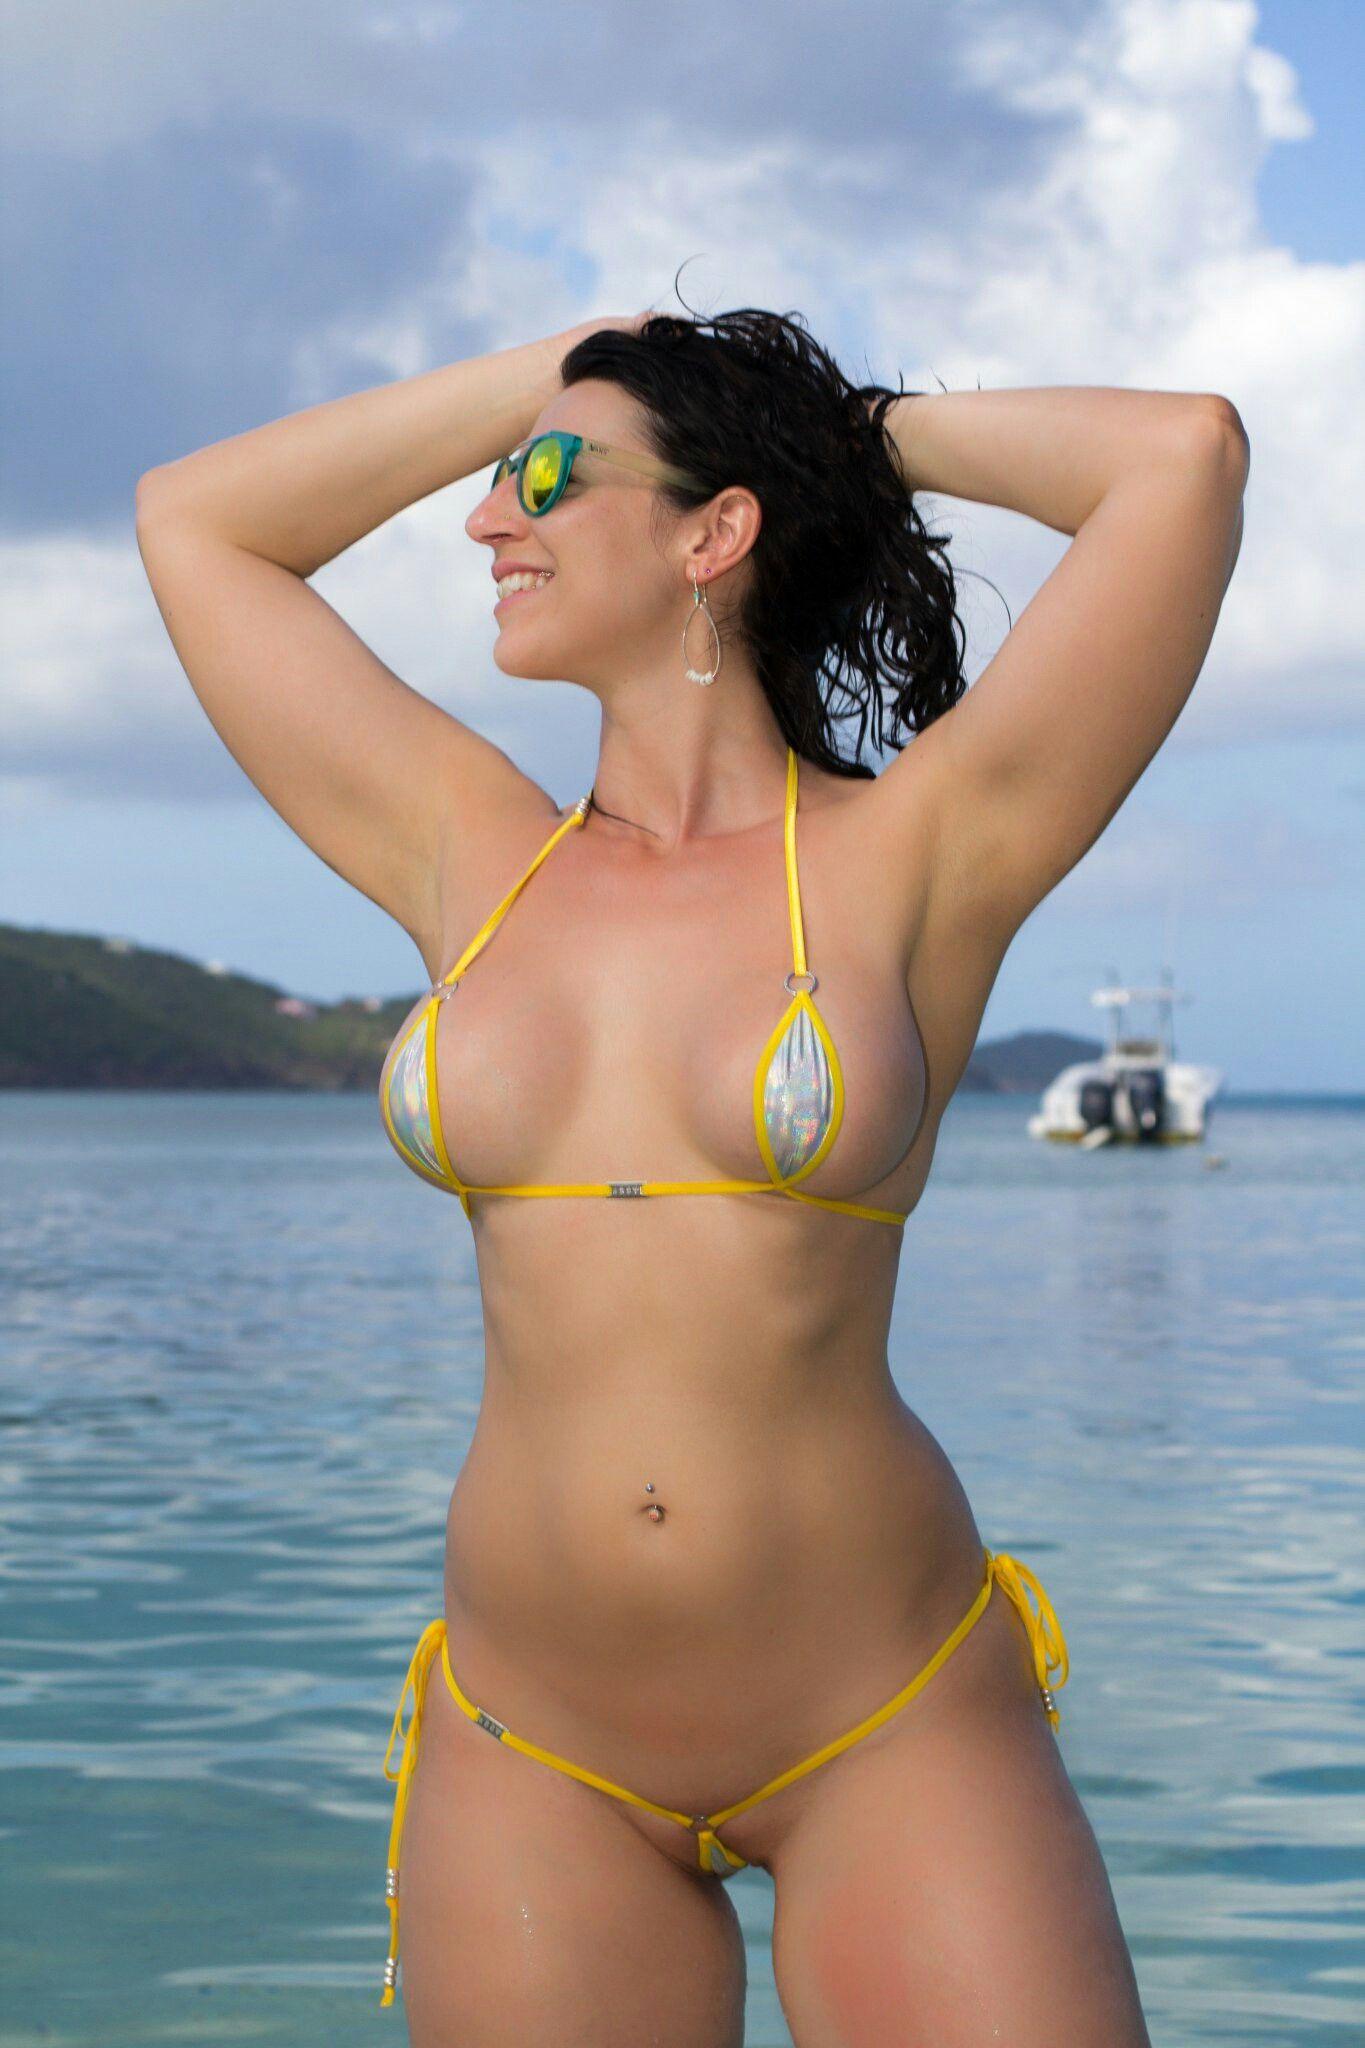 St tropez mini micro bikini beach